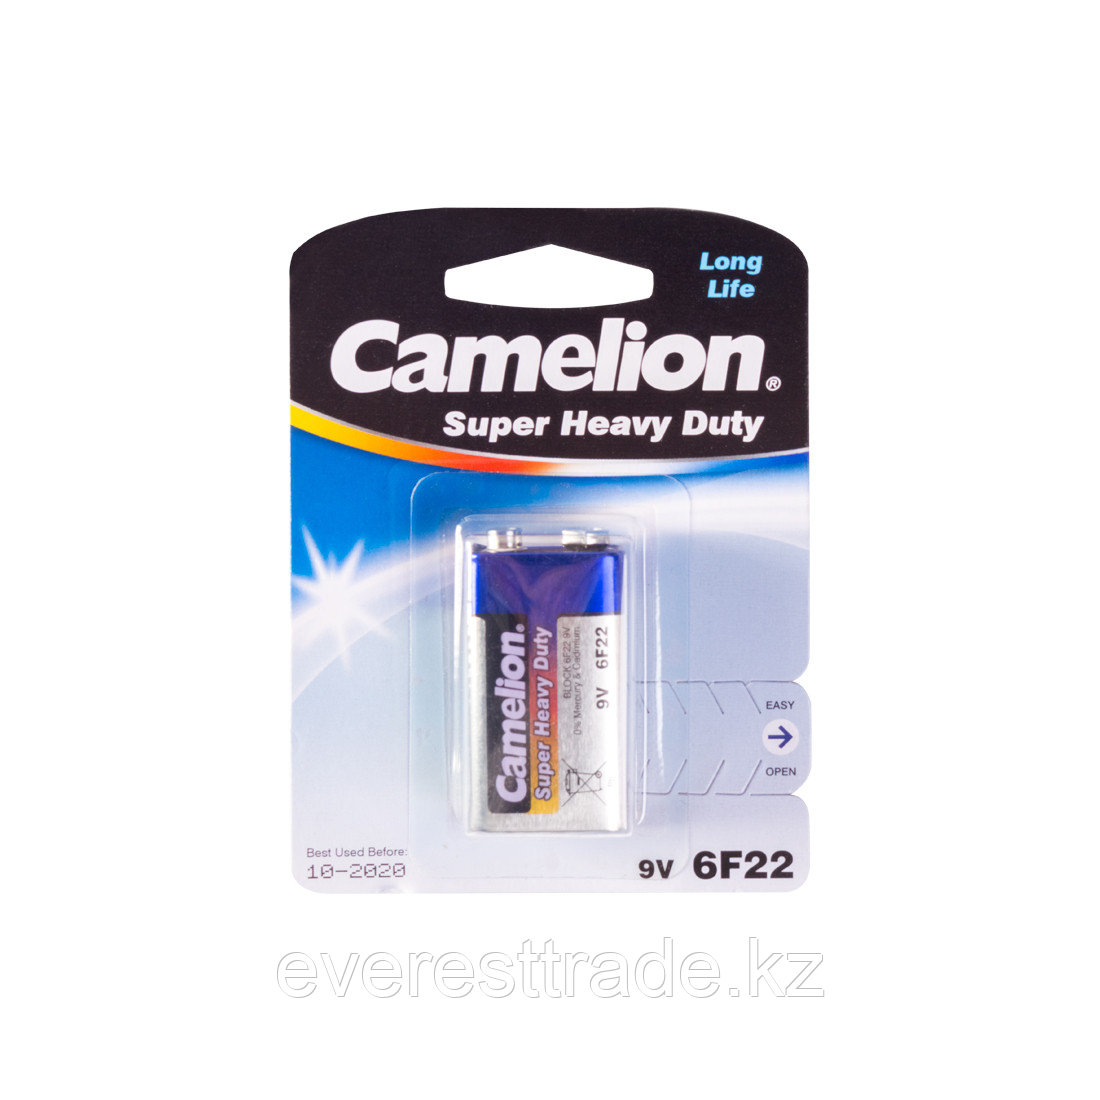 Camelion Батарейка, CAMELION, 6F22-BP1B, Солевая, 6F22(крона), 9V, 680 mAh, 1 шт., Блистер